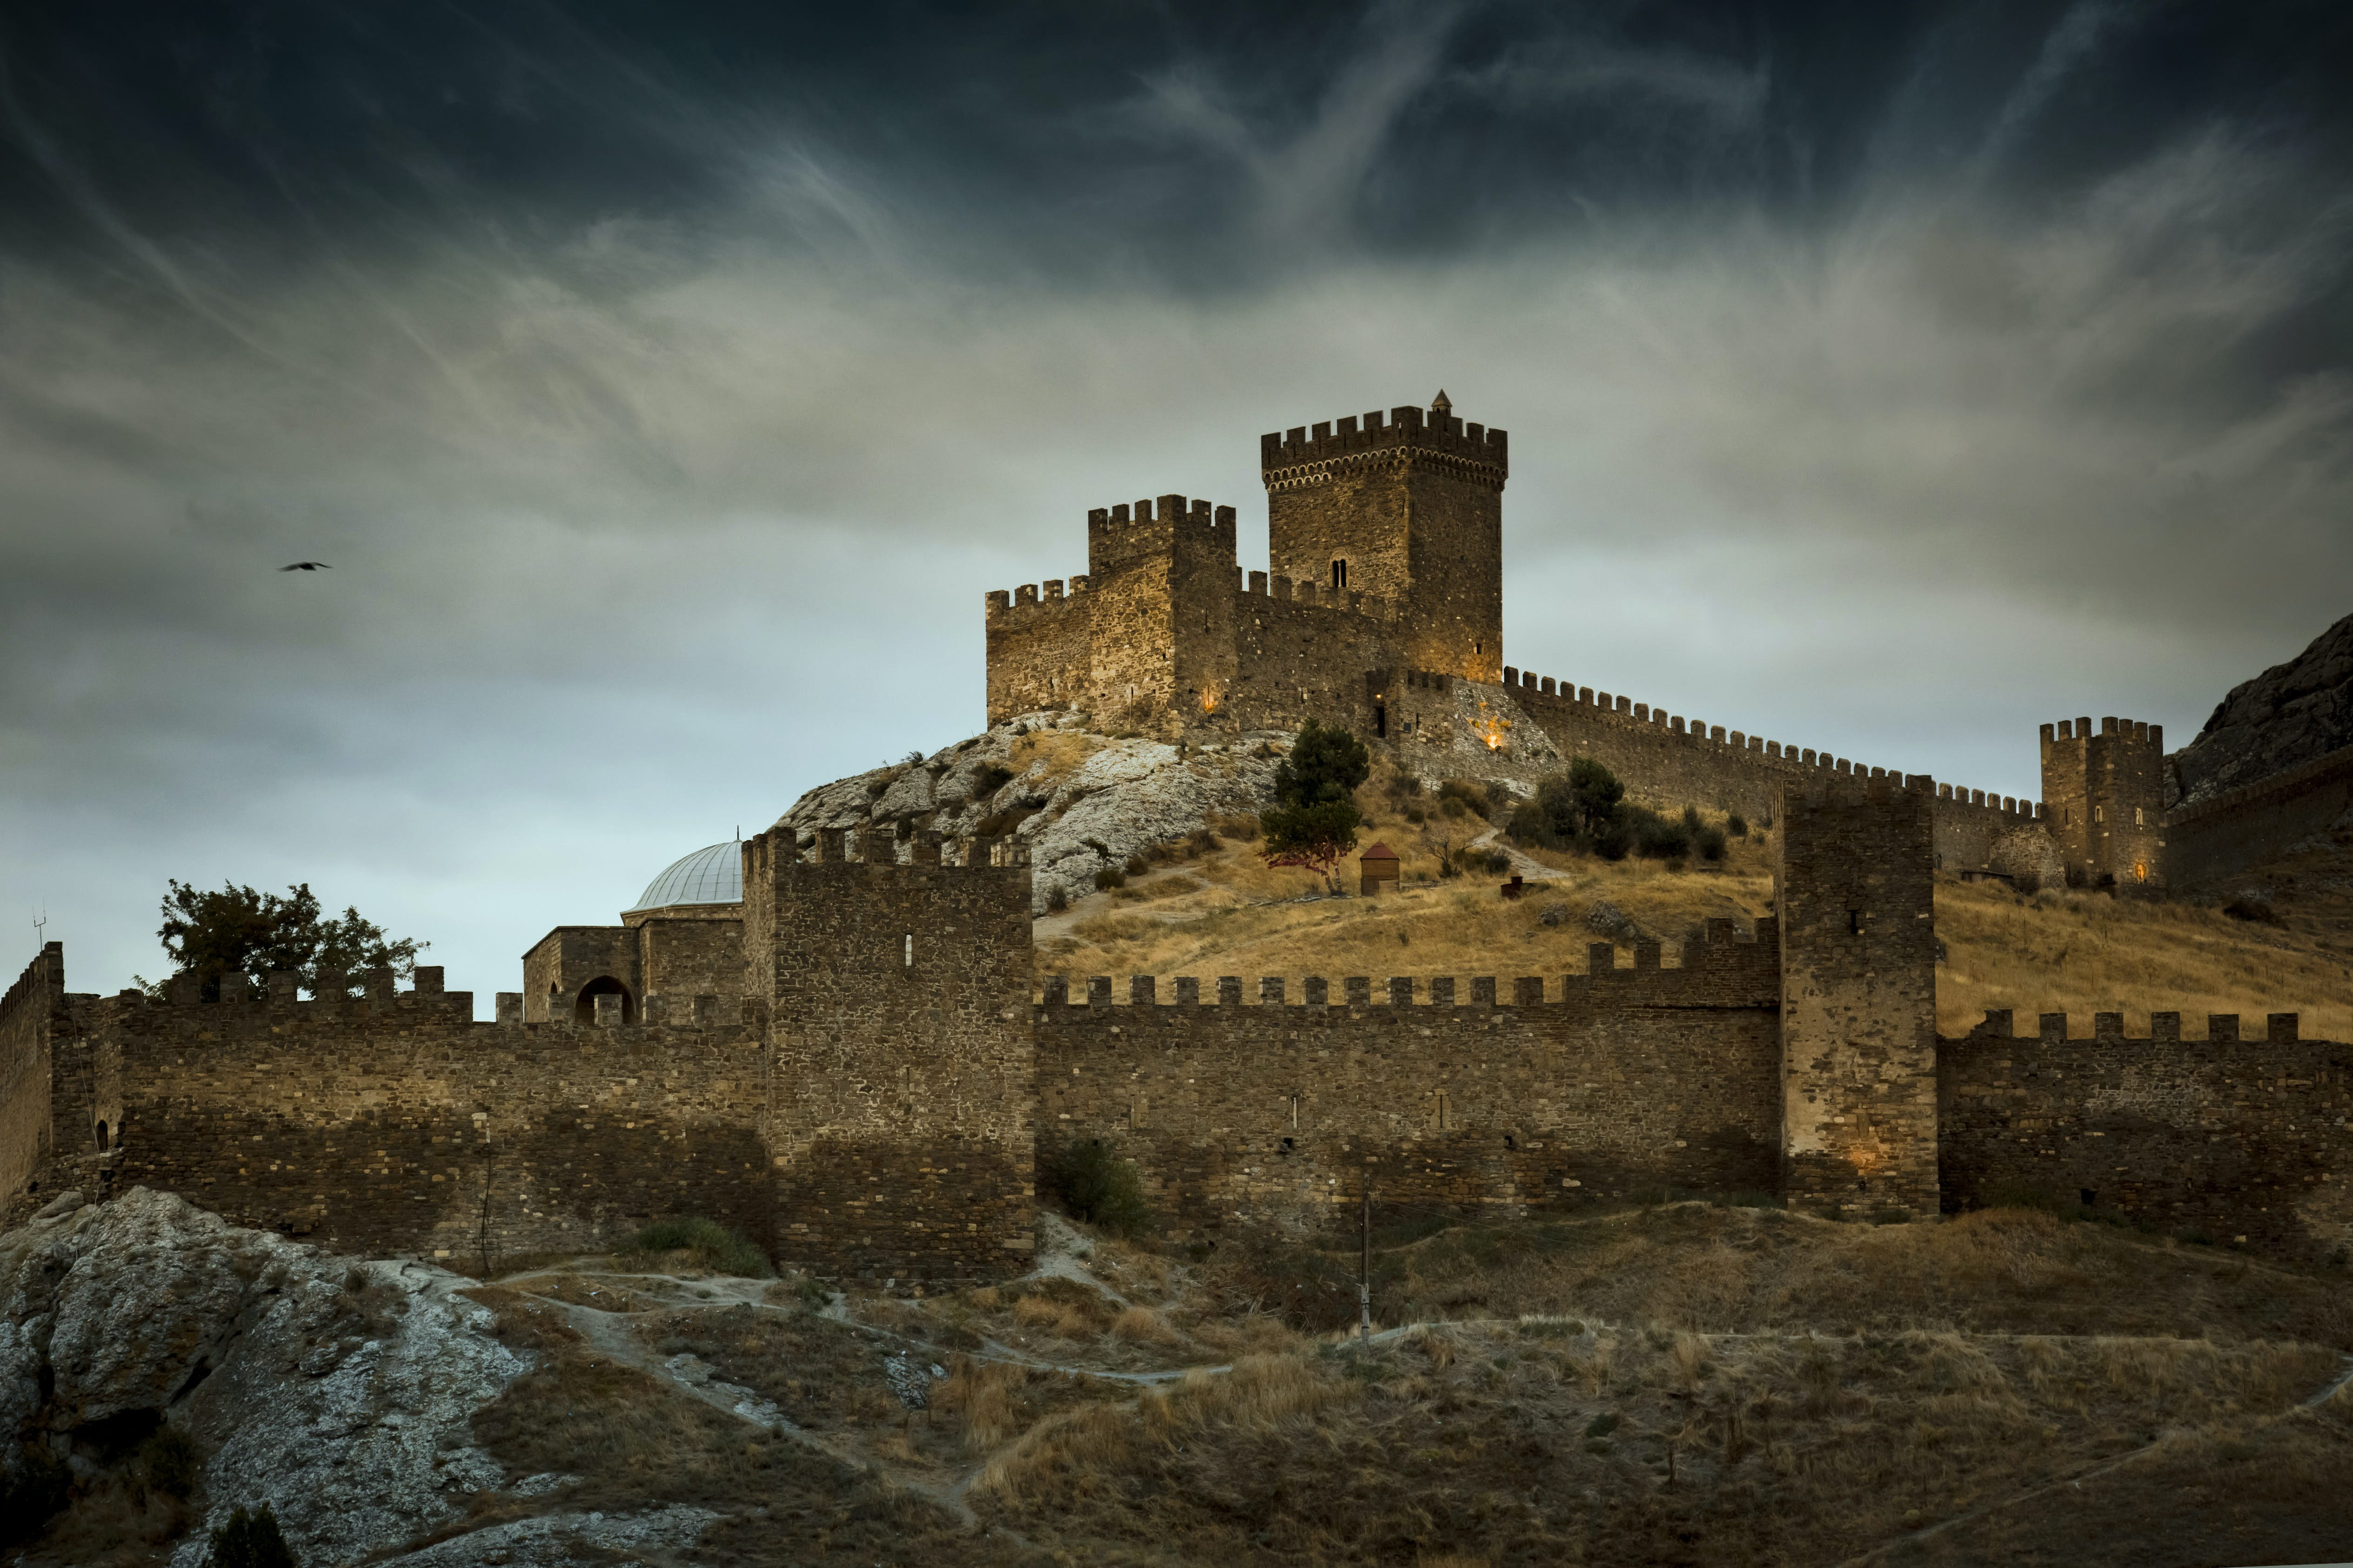 Castles were central to medieval warfare